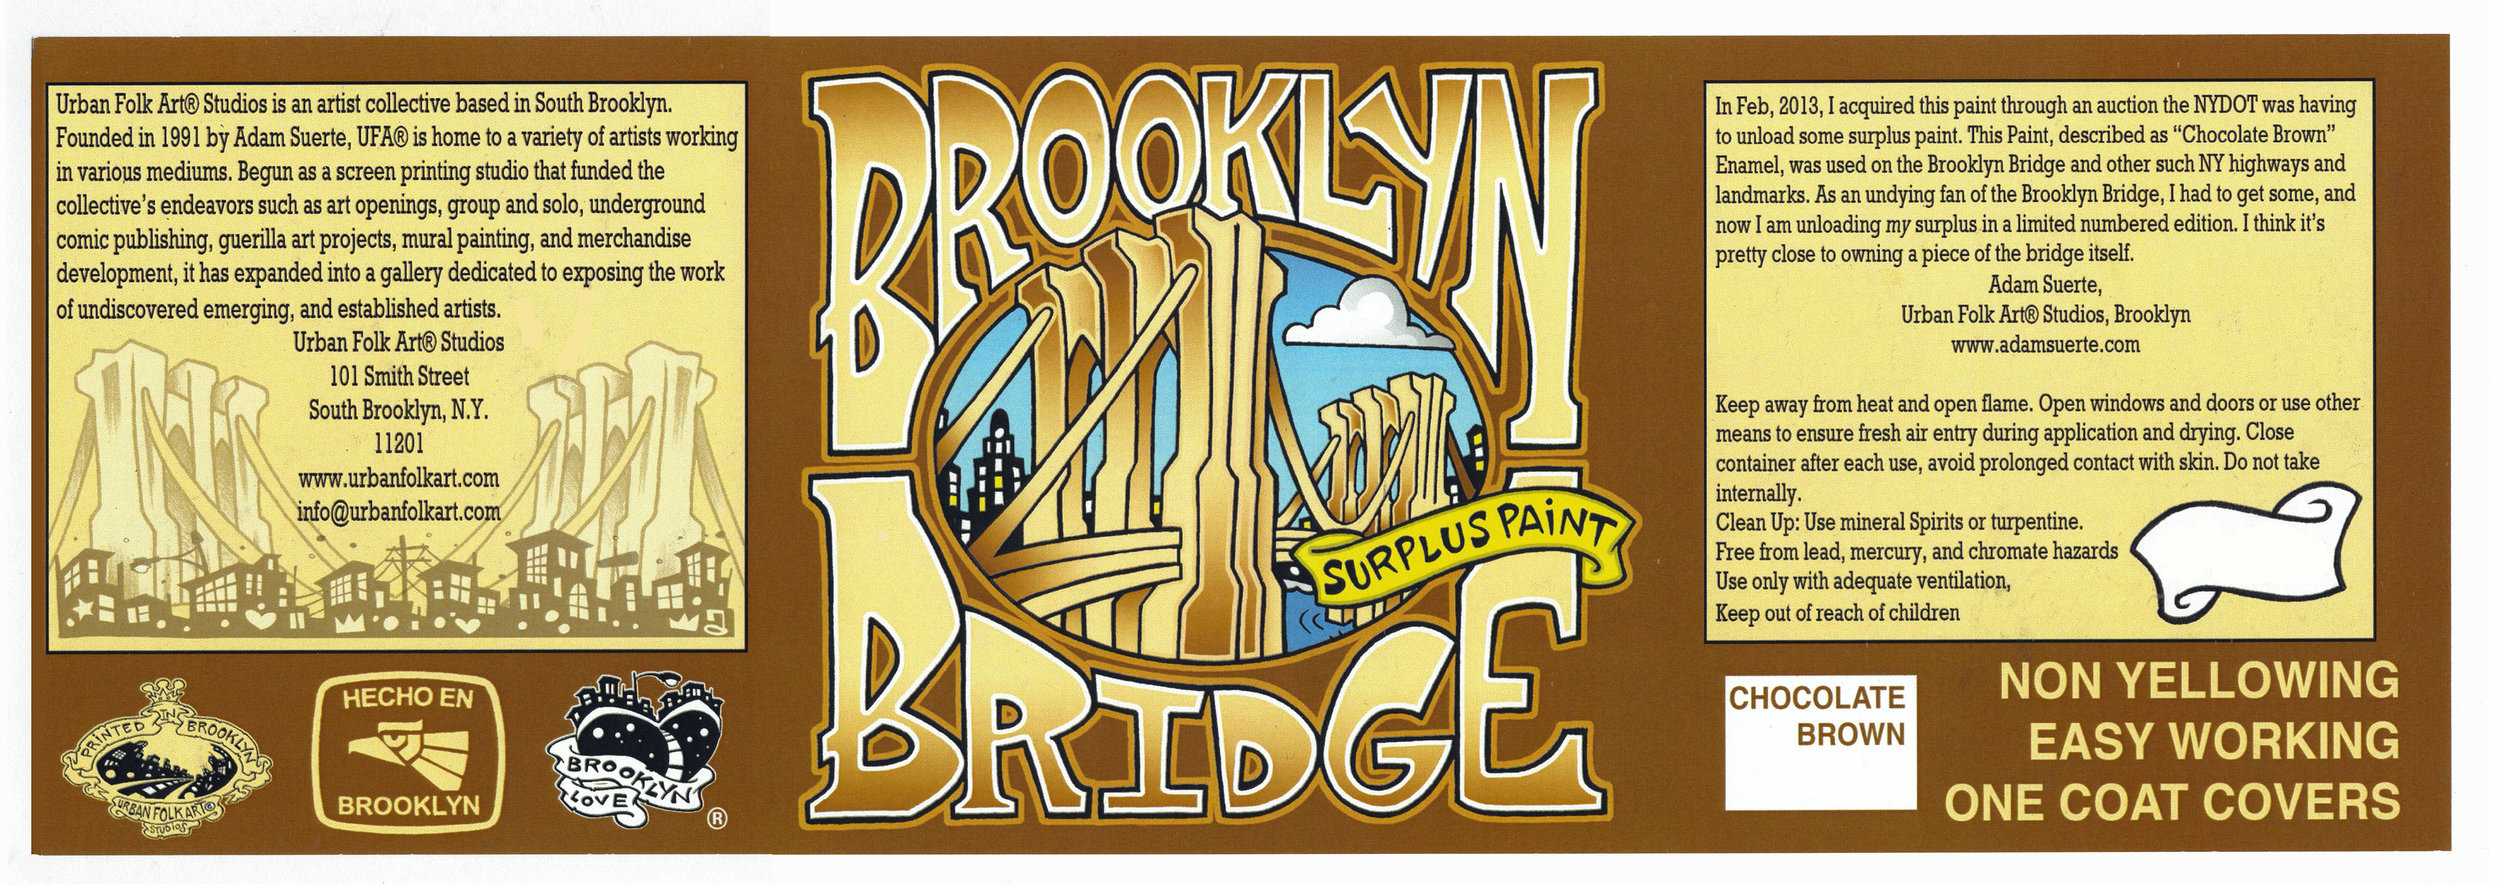 bridgepaintlabel.jpg